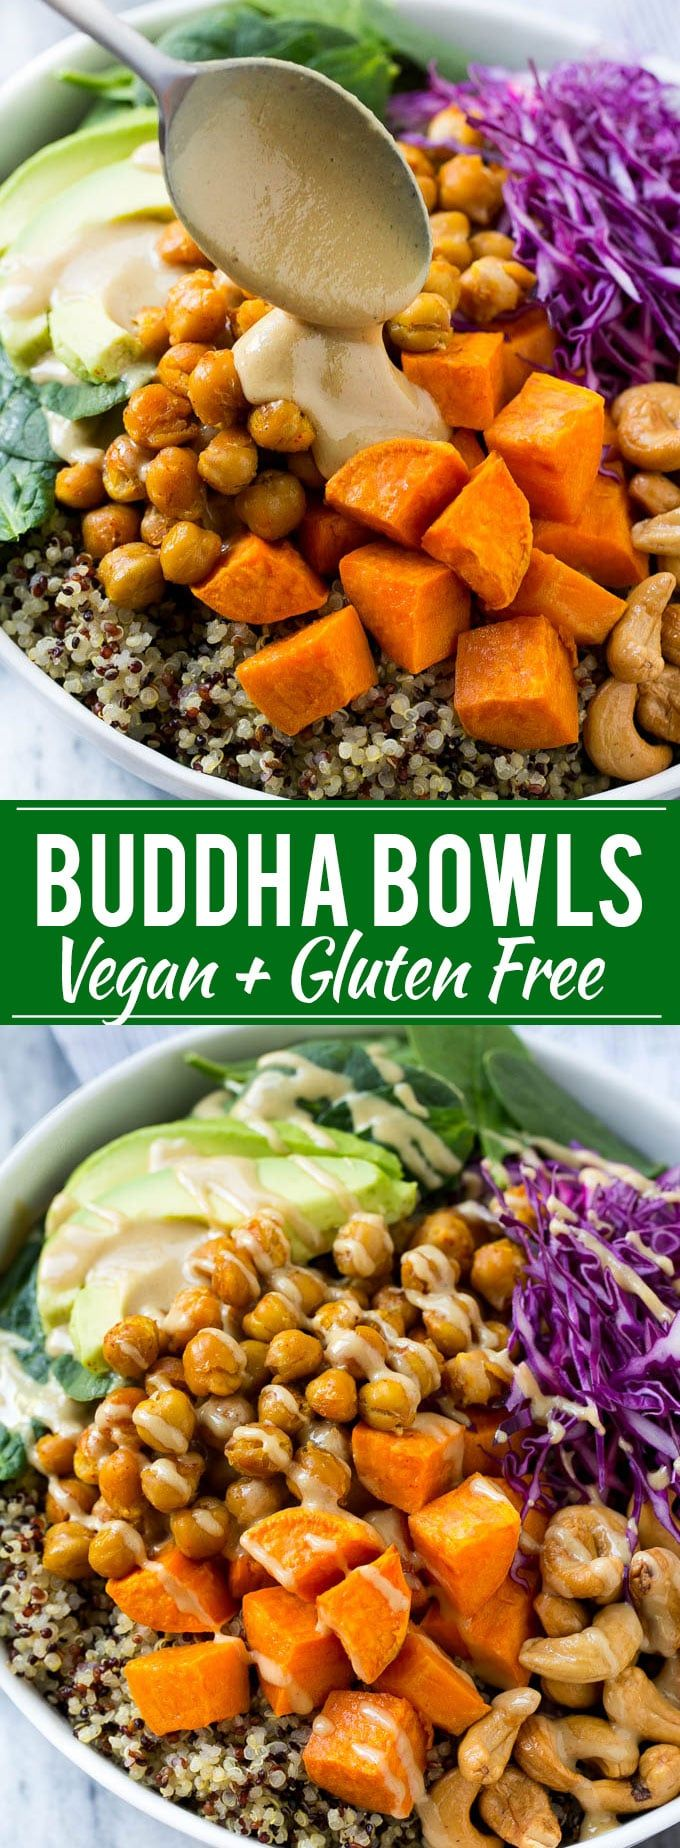 Buddha Bowl Recipe | Vegan Buddha Bowl | Quinoa Bowl | Sweet Potato Recipe | Quinoa Recipe  For more fitness tips, motivation, monthly support groups, and more visit:  https://www.facebook.com/HealthyFitMom0/